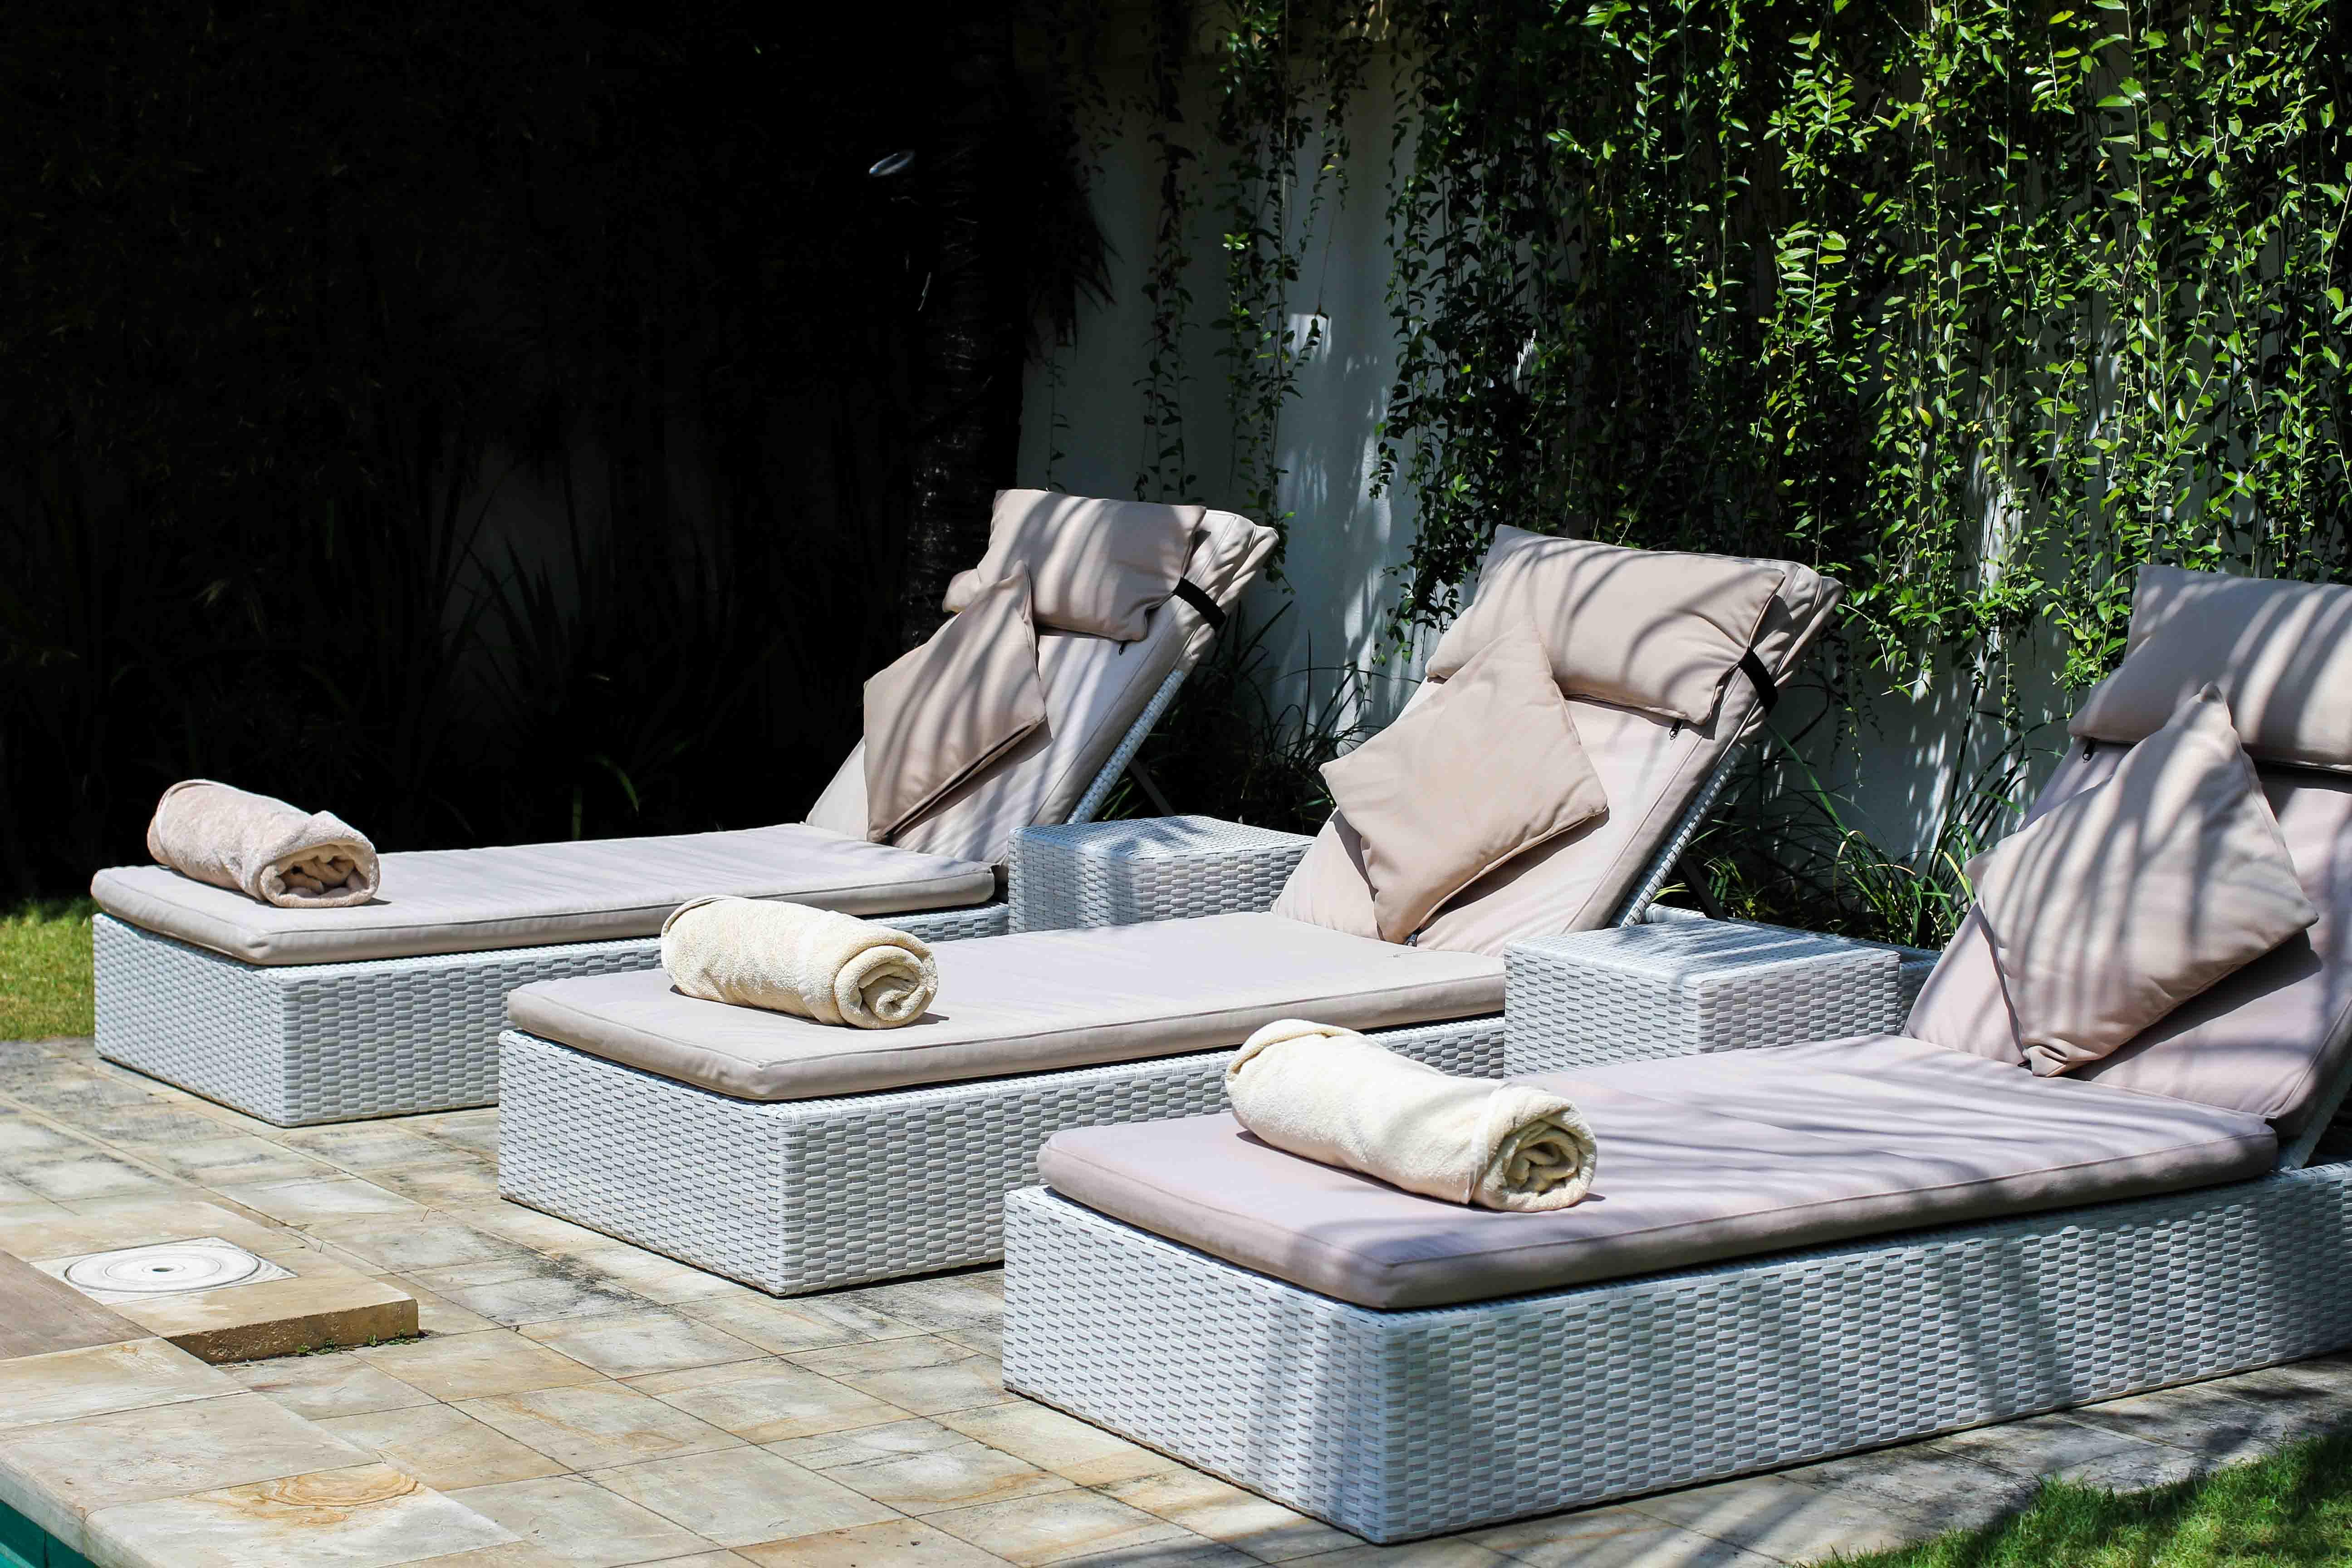 Sahana Villas Seminyak Poolvilla 3 Bedroom Seminyak Bali Luxusvilla mieten privater Pool Reiseblogger 3